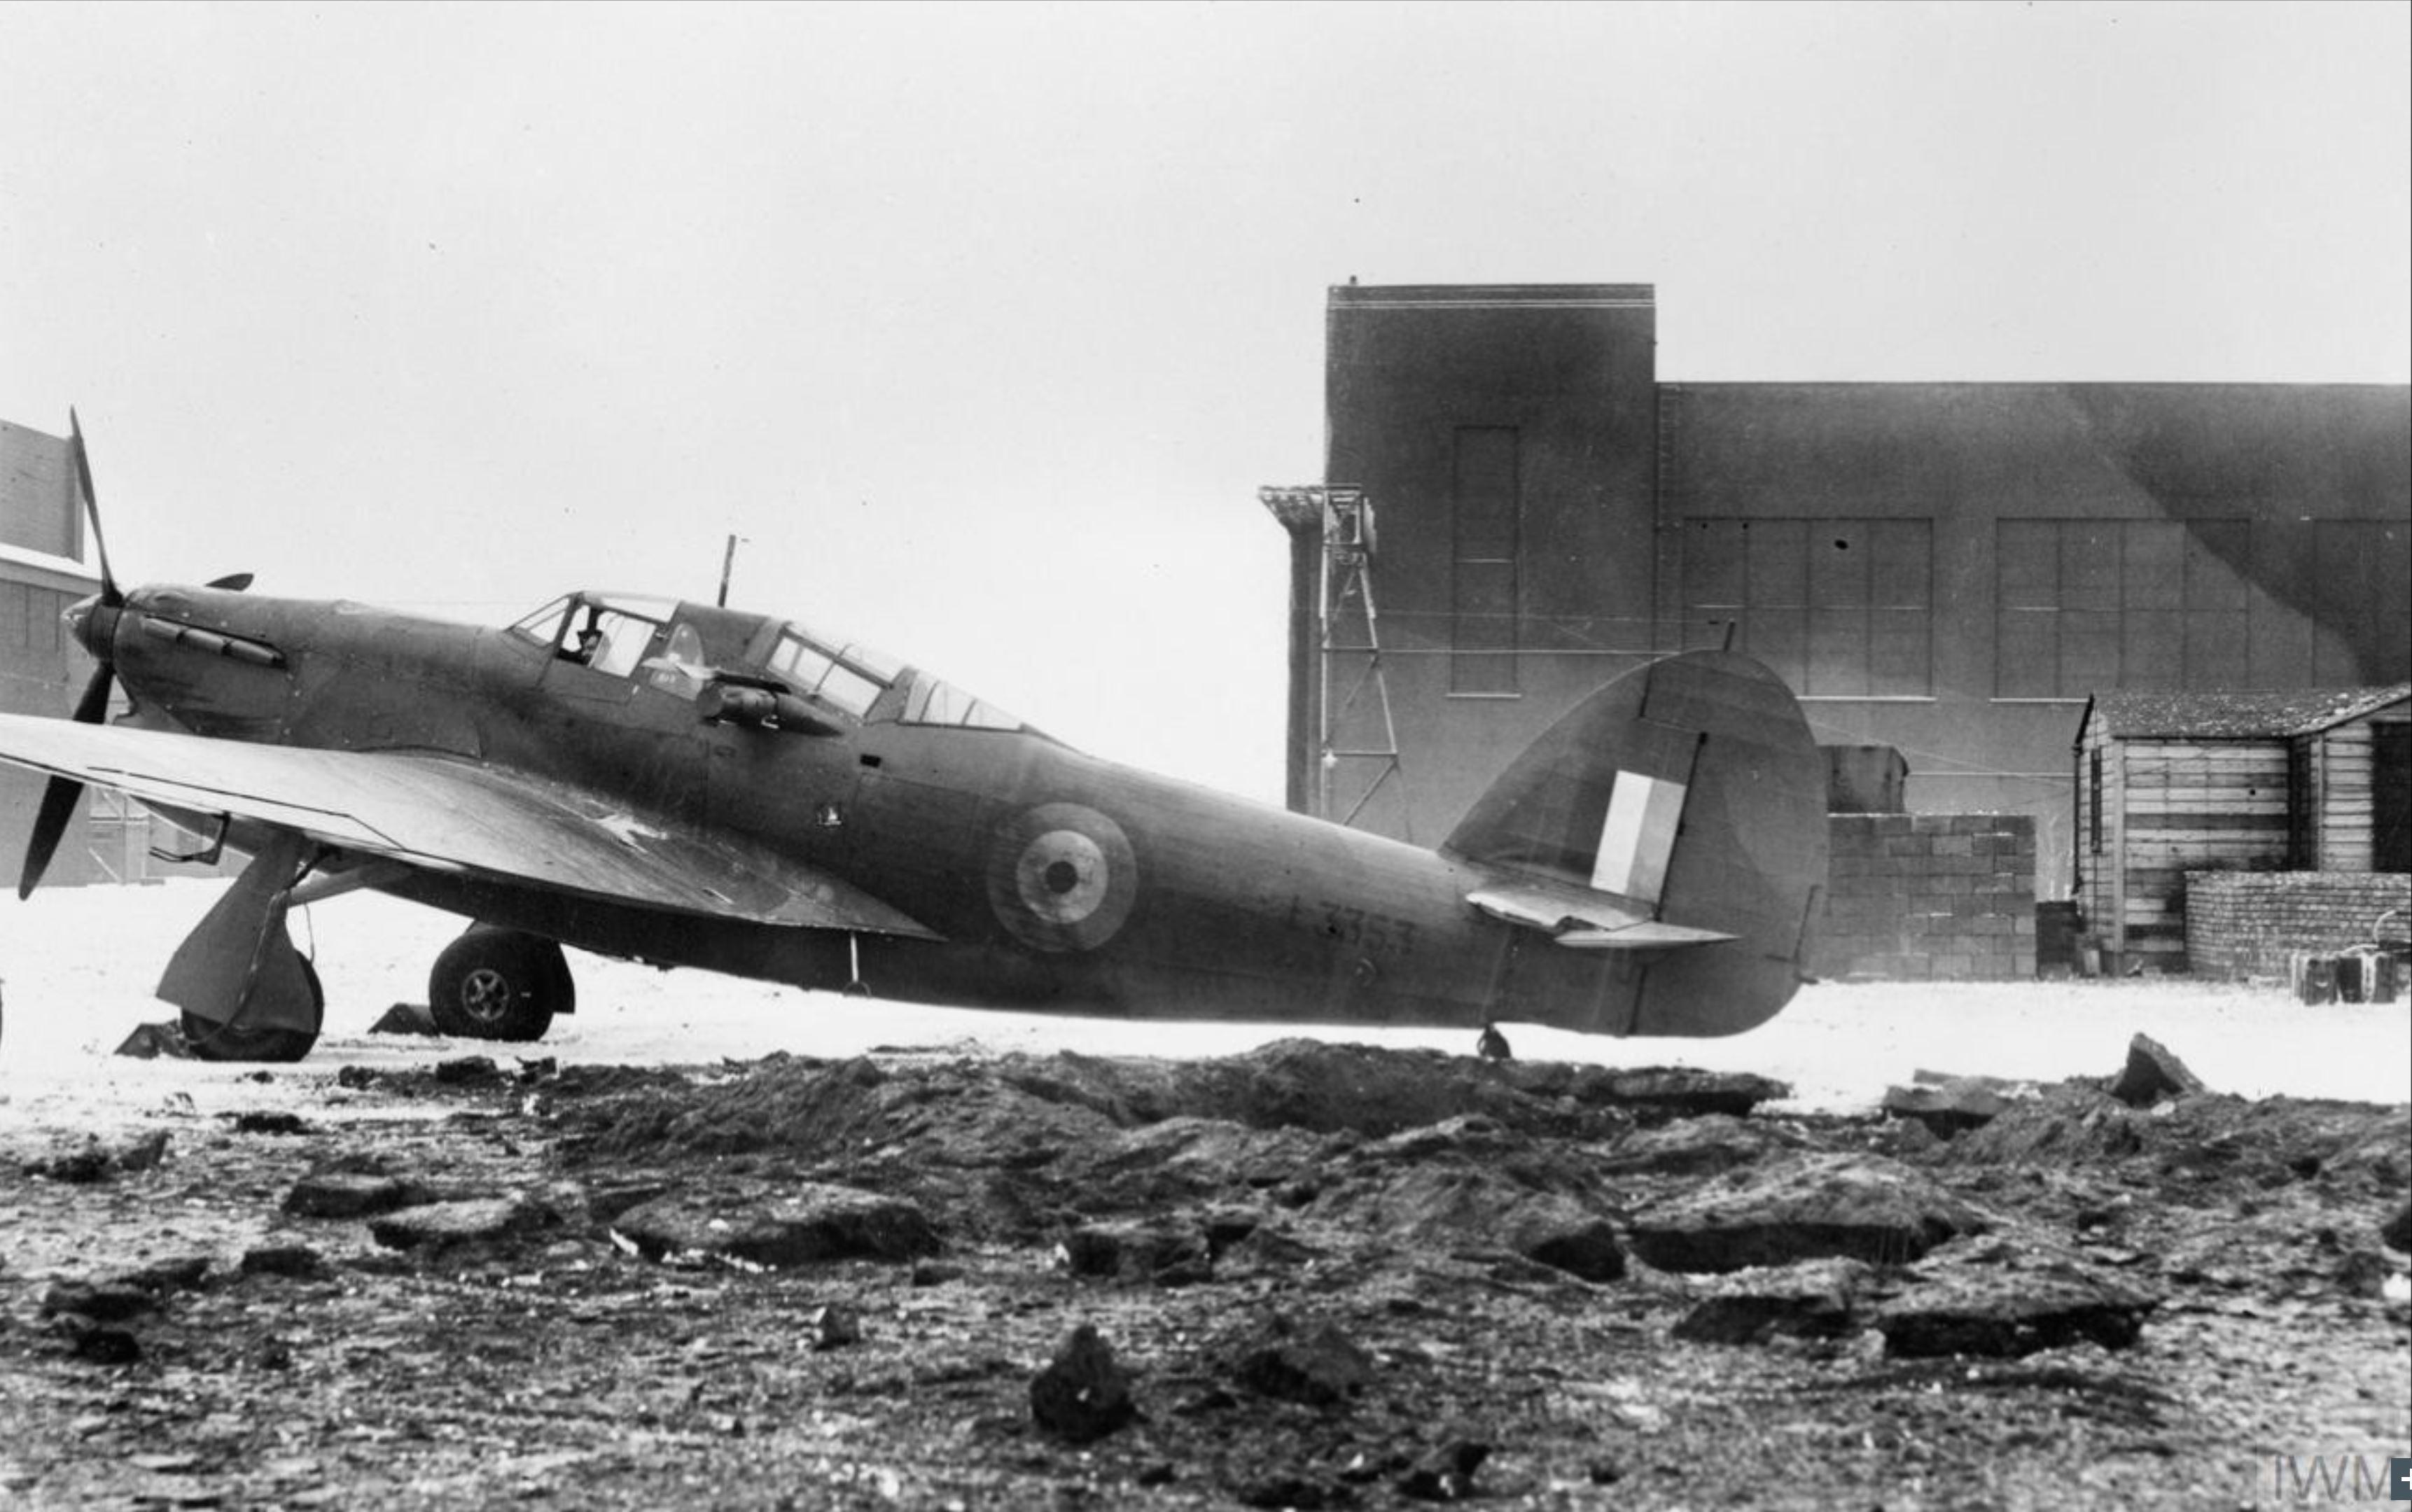 Hawker Henley RAF 1AACU 1 Anti Aircraft Co operation Unit L3353 at Bircham Newton Cambridgeshire IWM CE43